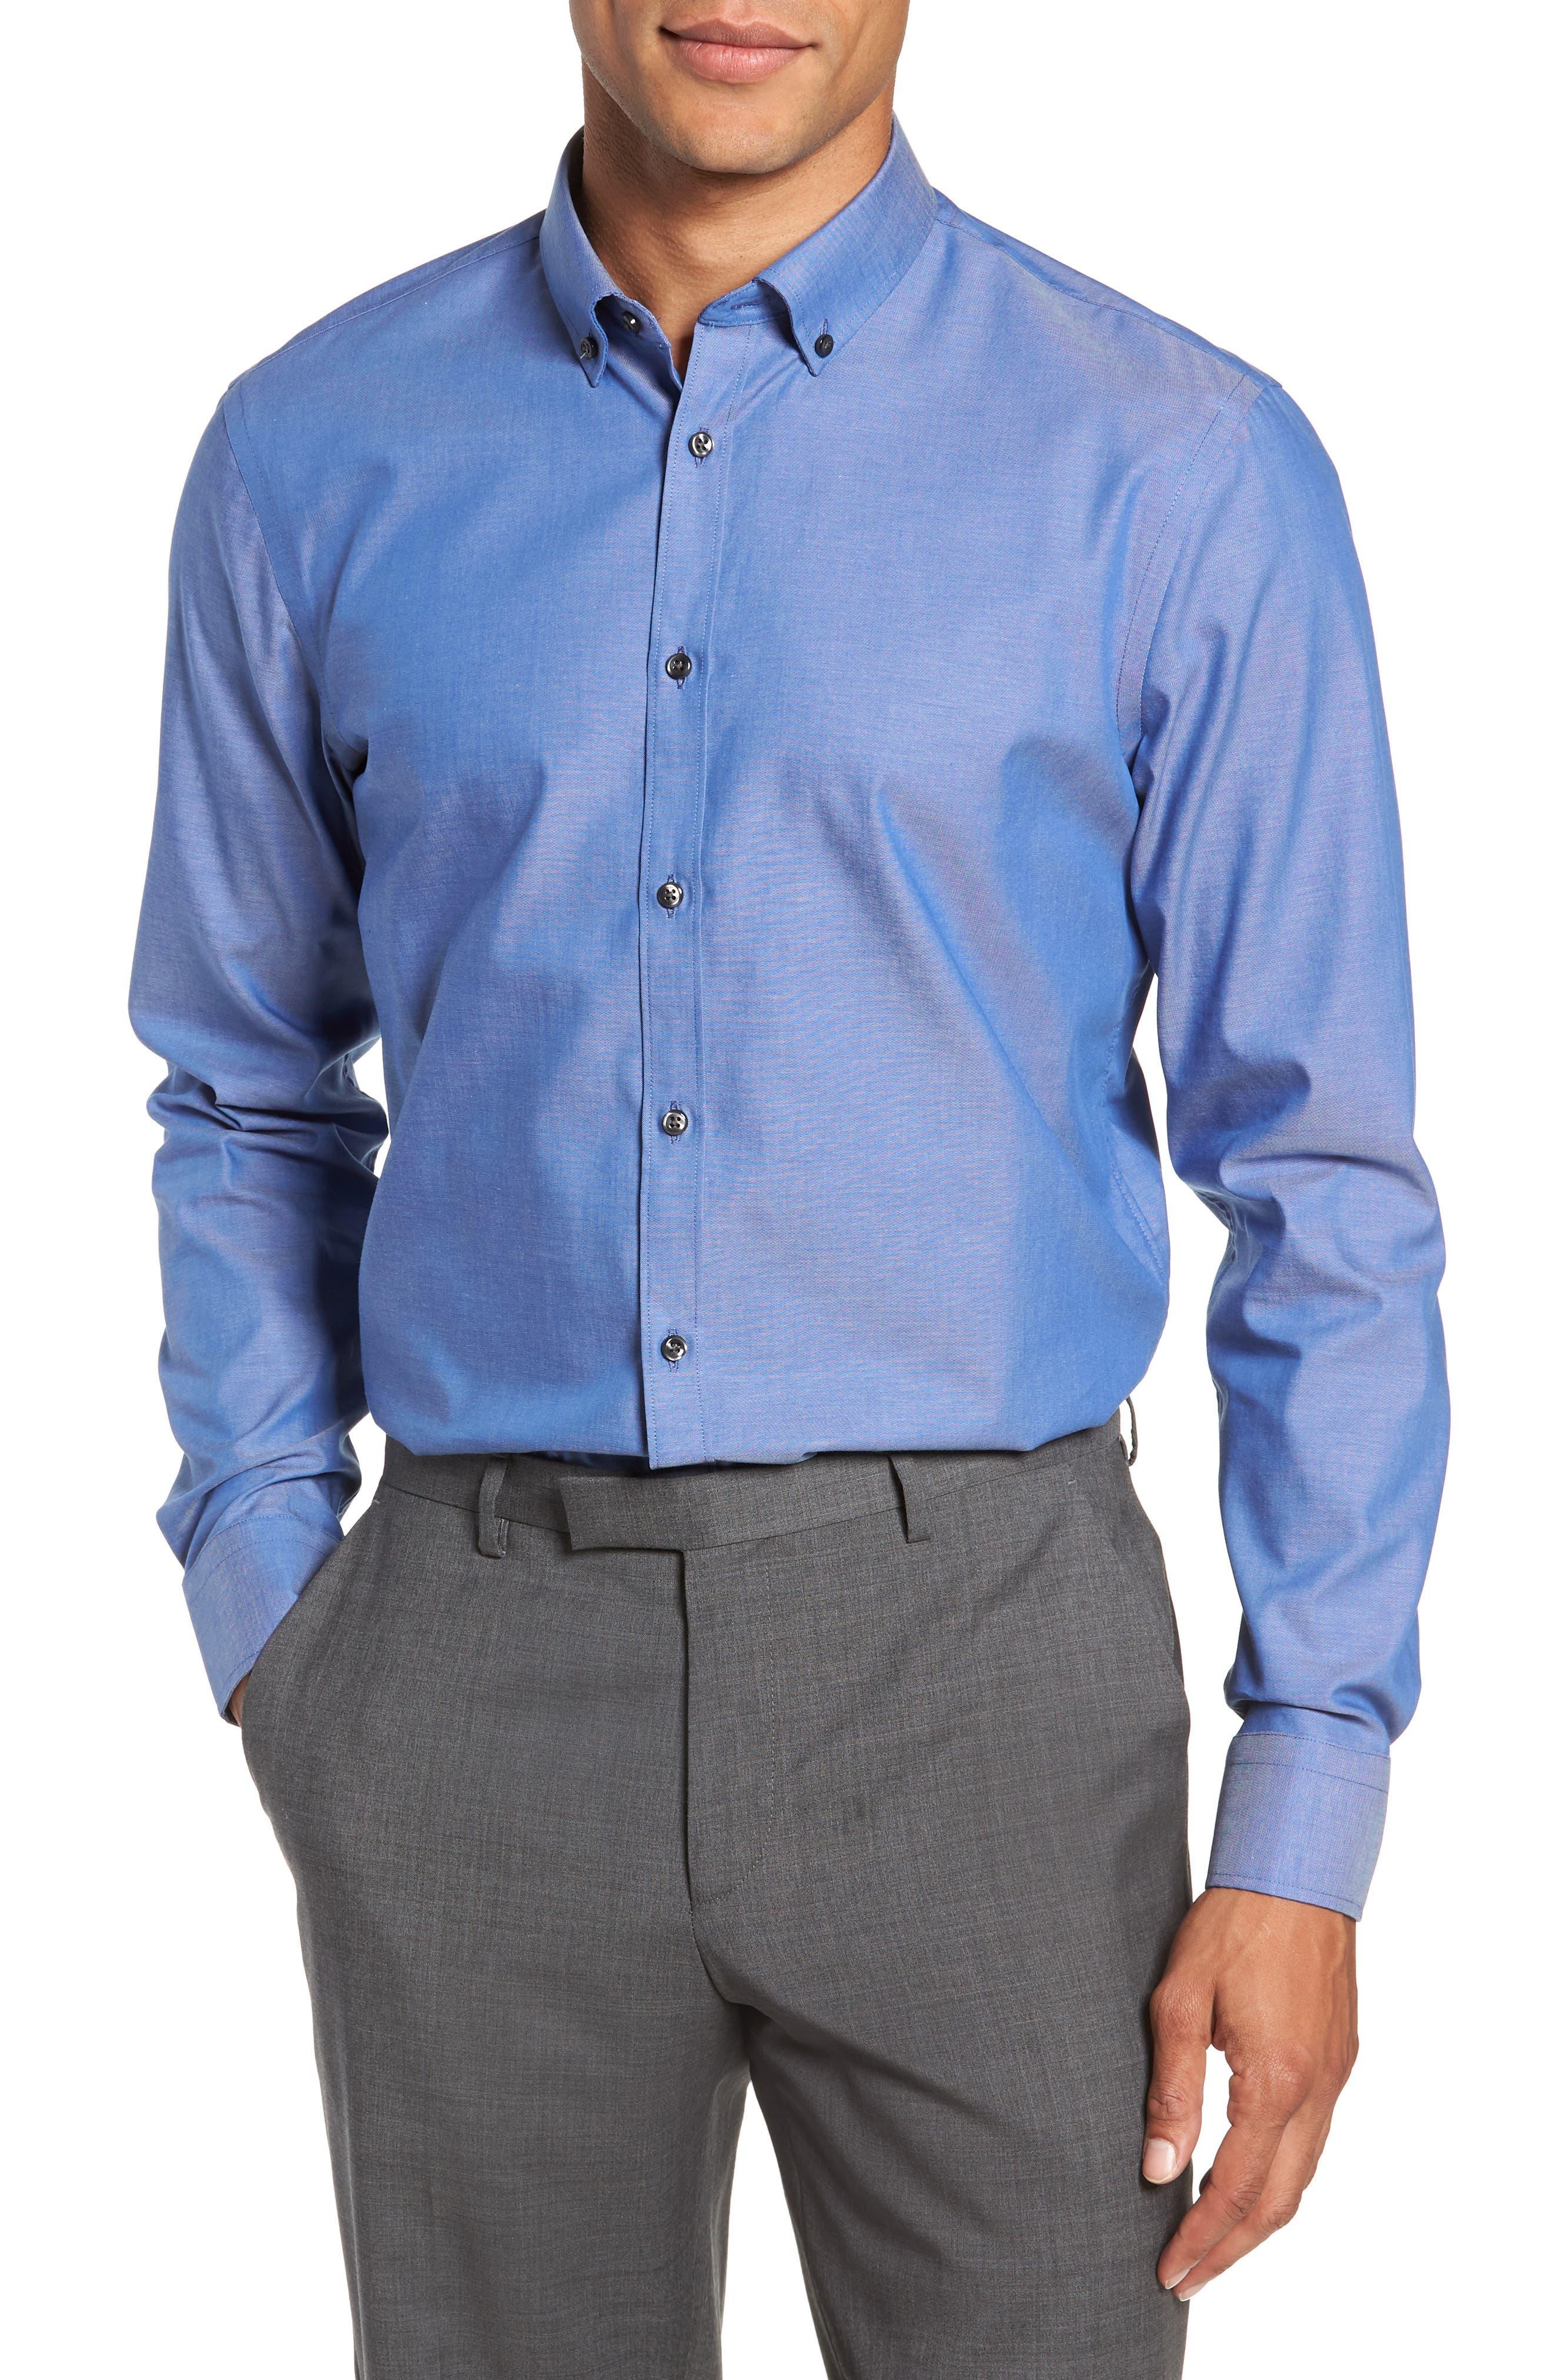 Extra Trim Fit Non-Iron Dress Shirt,                         Main,                         color, 420